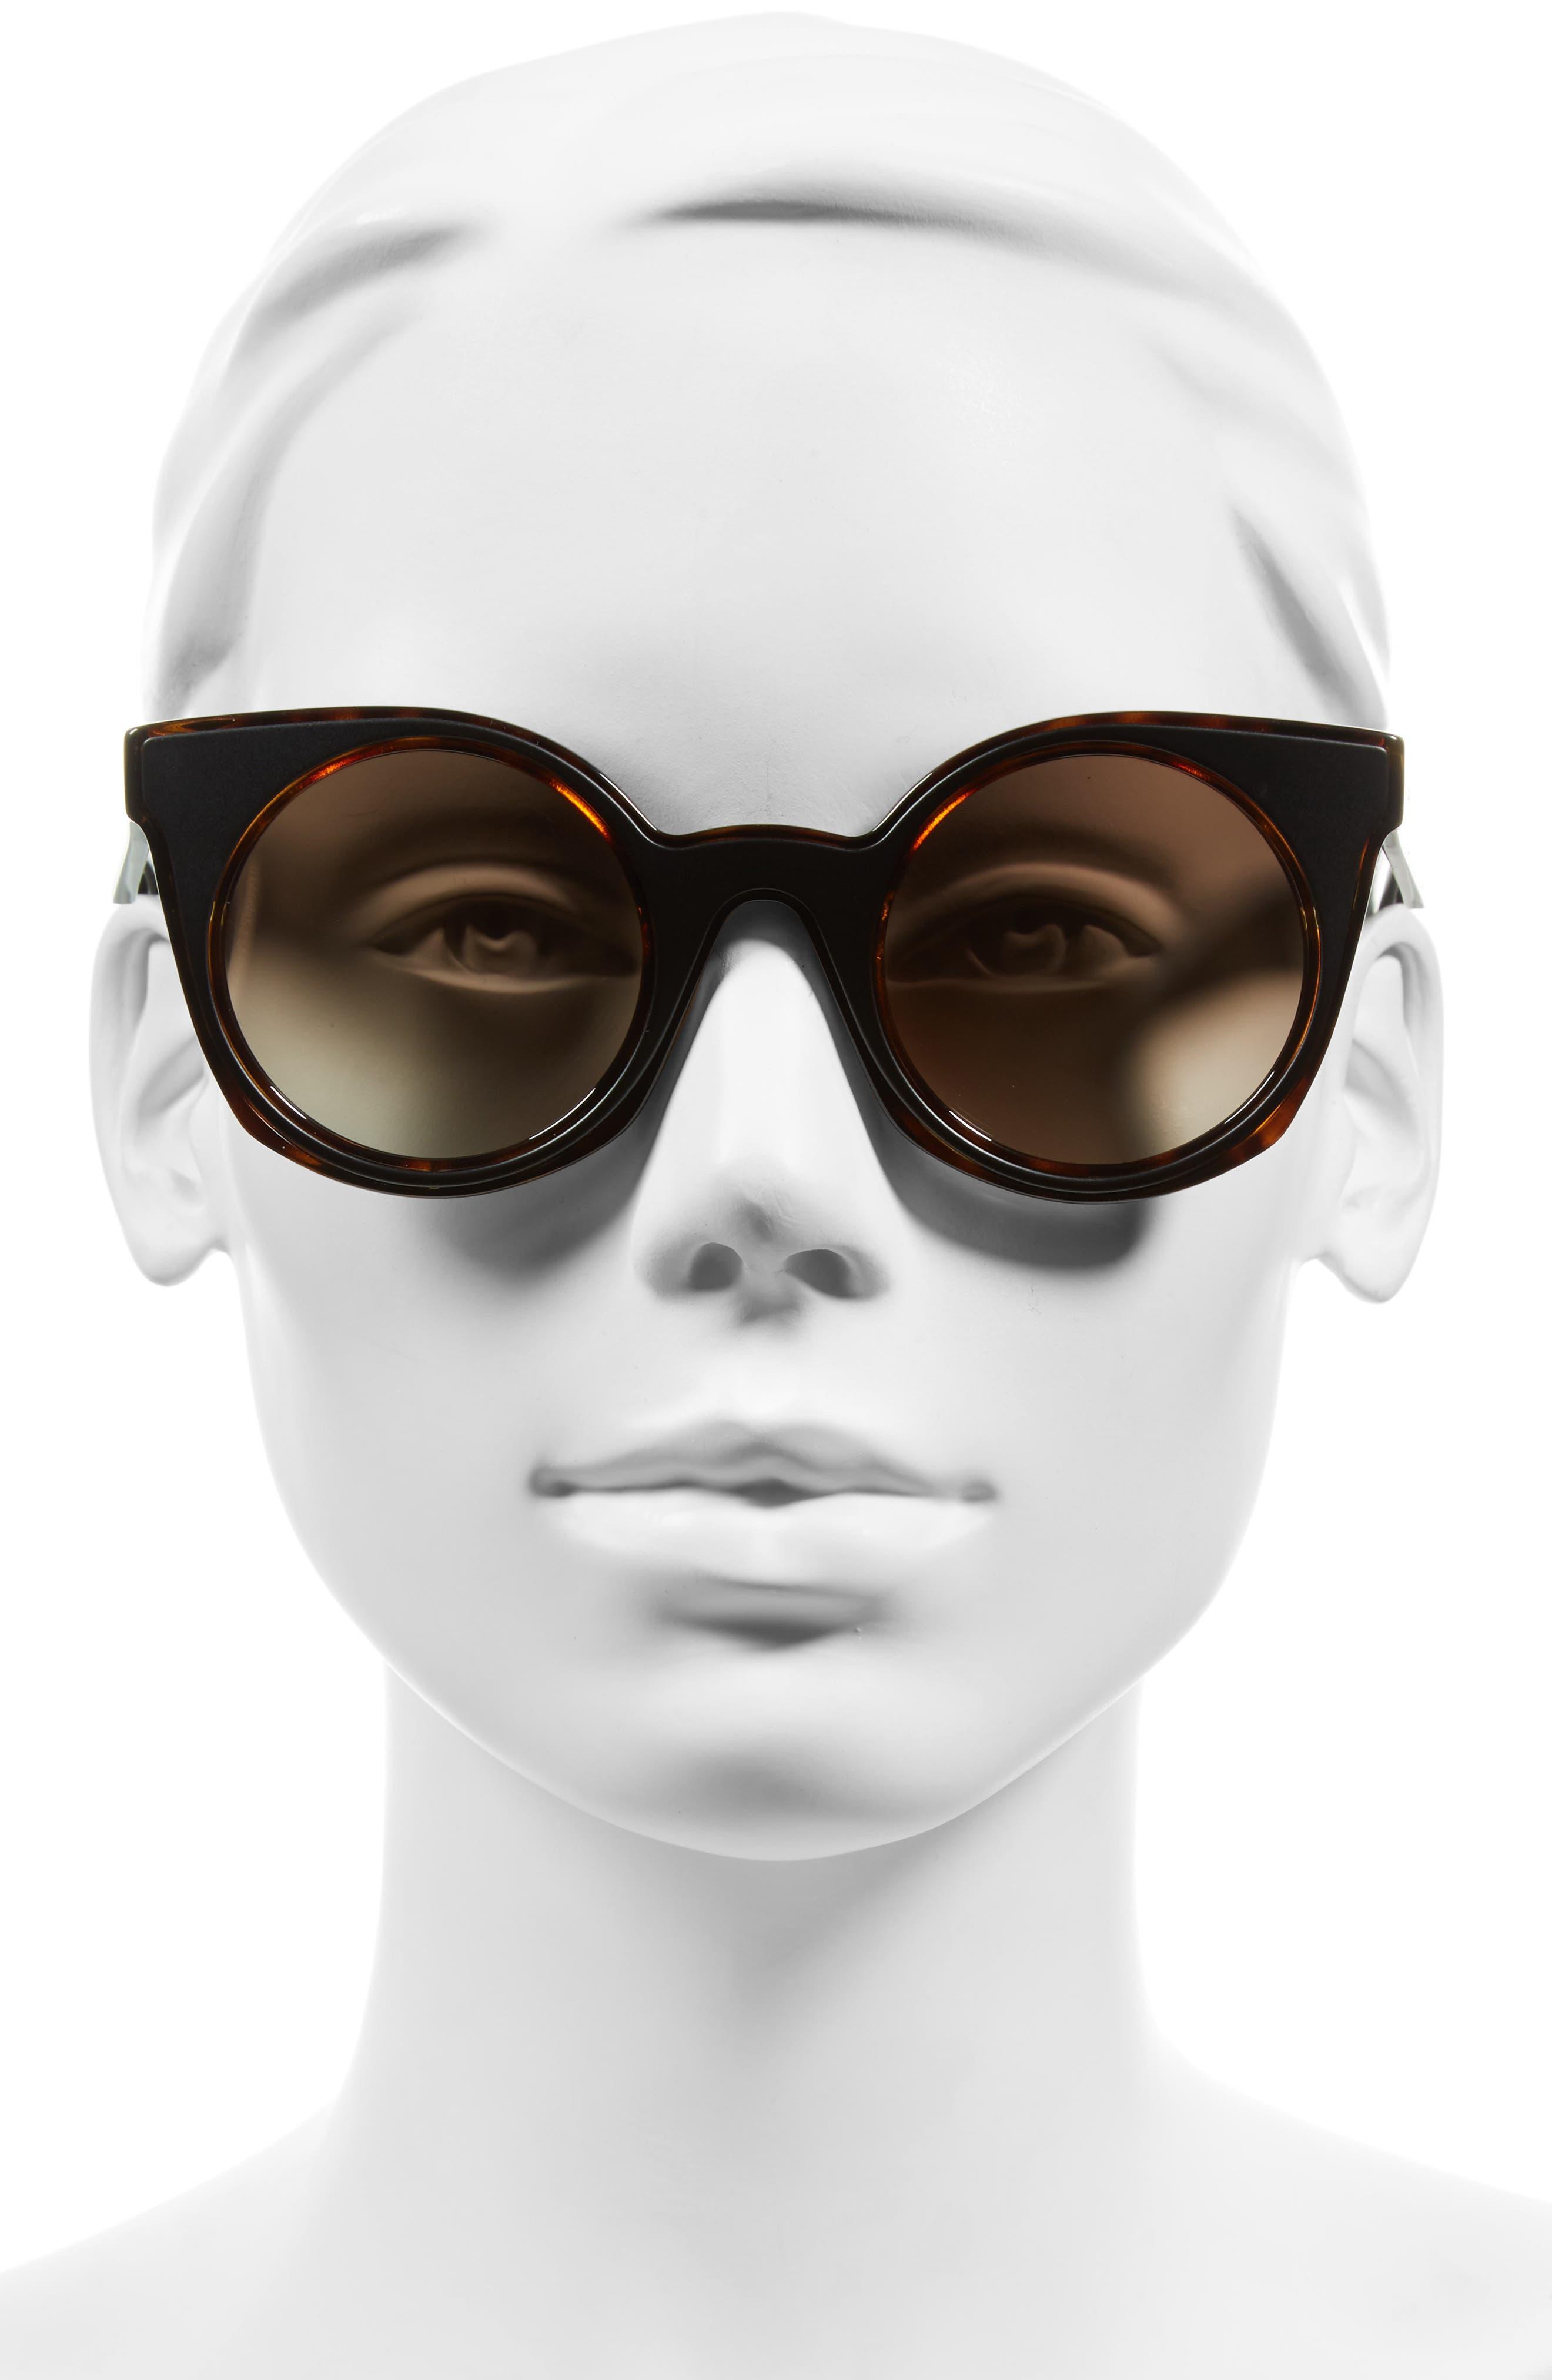 48mm Cat Eye Sunglasses,                             Alternate thumbnail 3, color,                             210